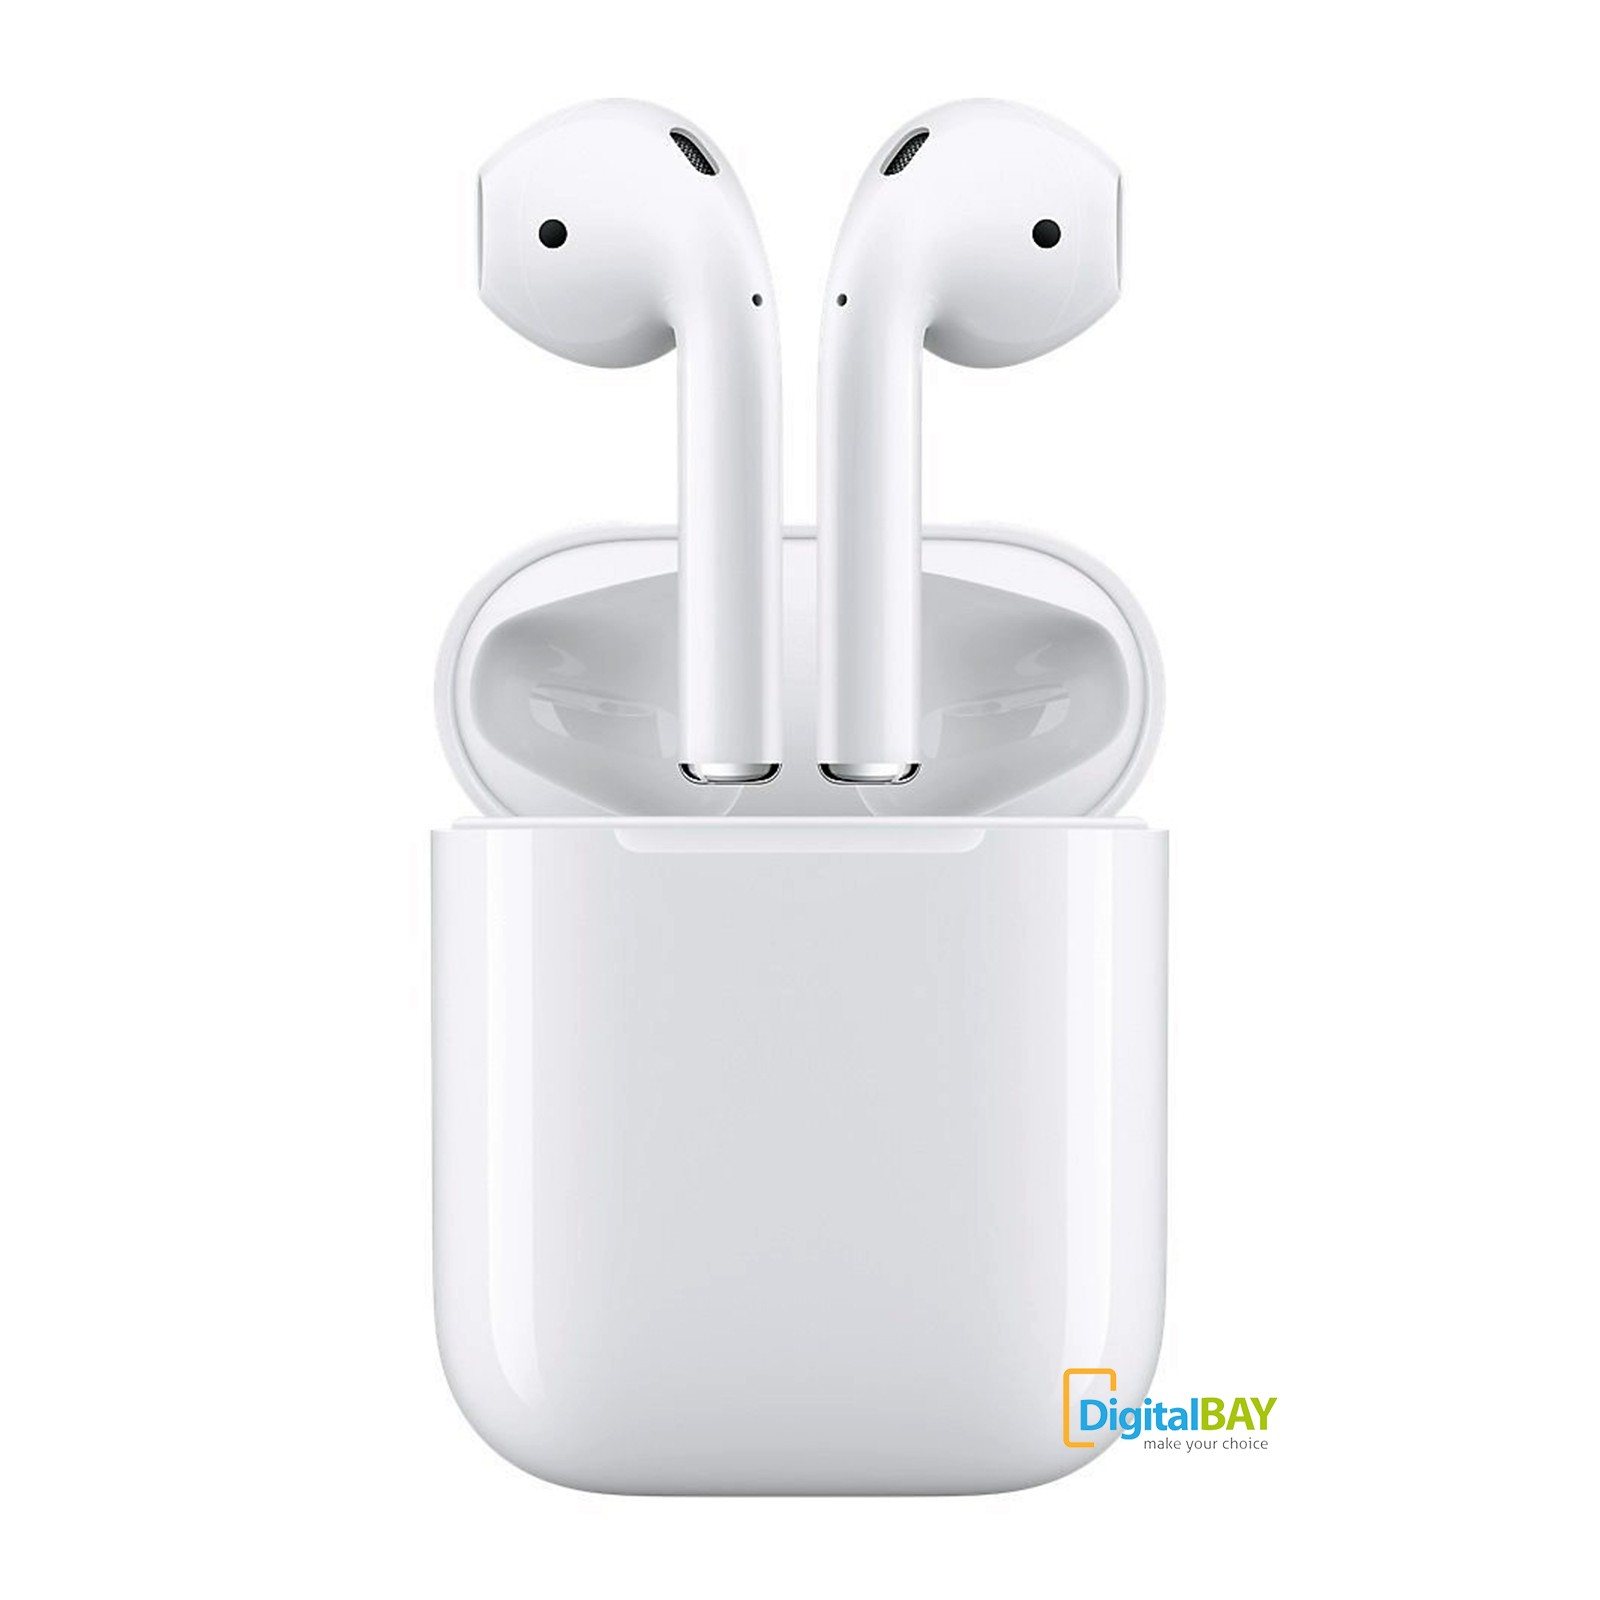 Auricolare Cuffia Bluetooth In-Ear BT Apple Airpods MMEF2ZM A Blister Per  Iphone a384f4422ca7